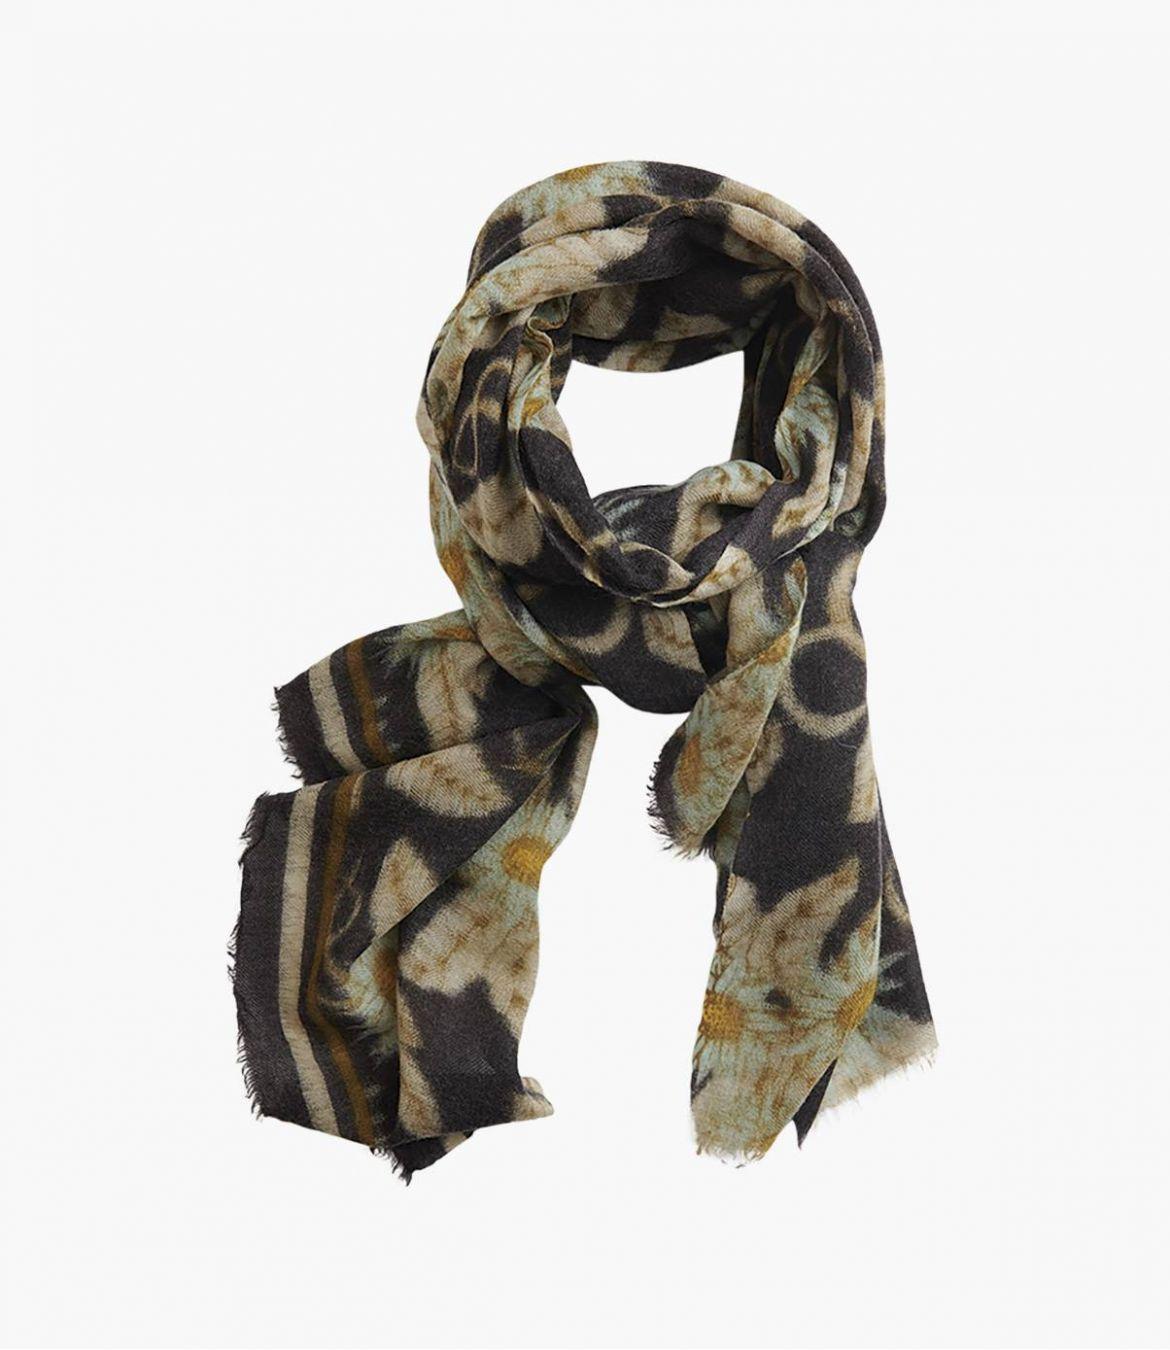 FLEURIE Women's Wool Scarf 70x190 cm Storiatipic - 1